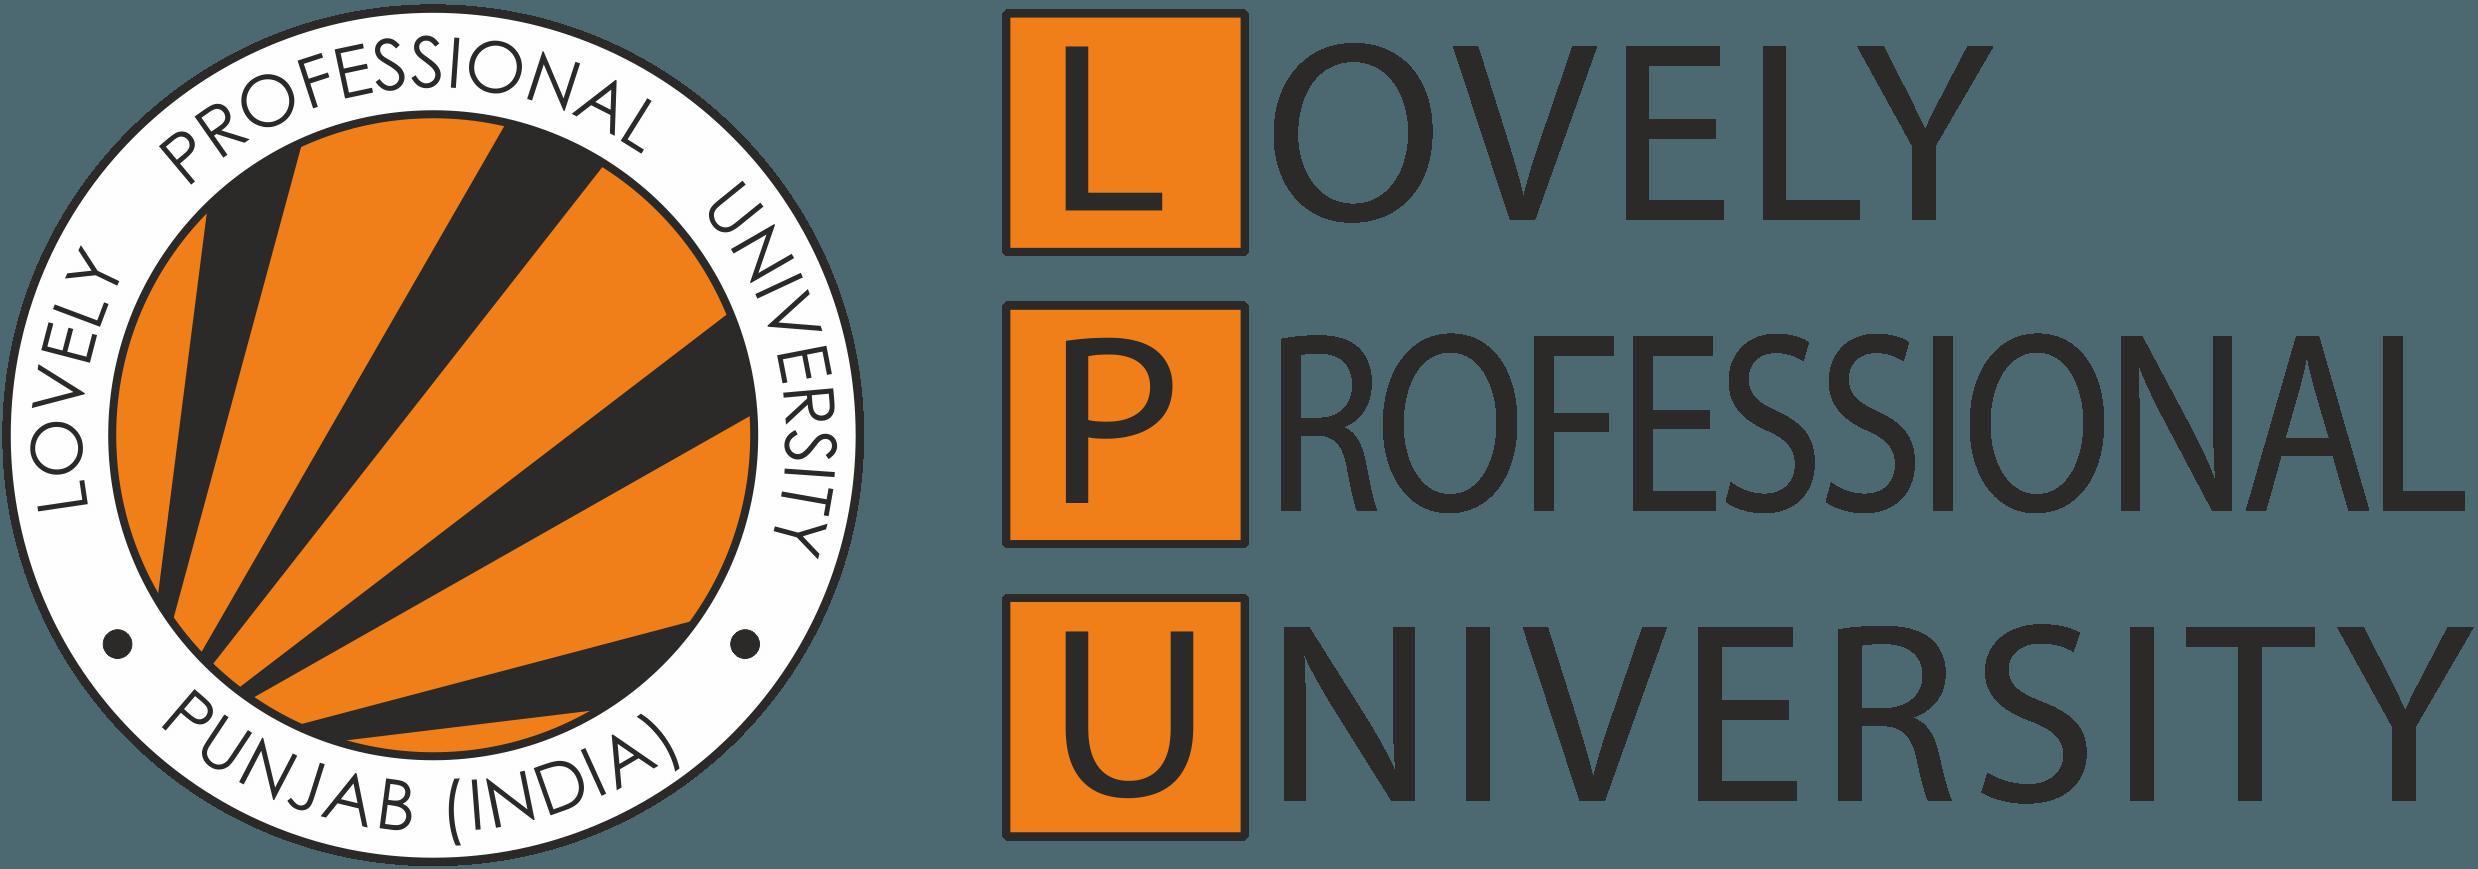 LPU Logo   Lovely Professional University png